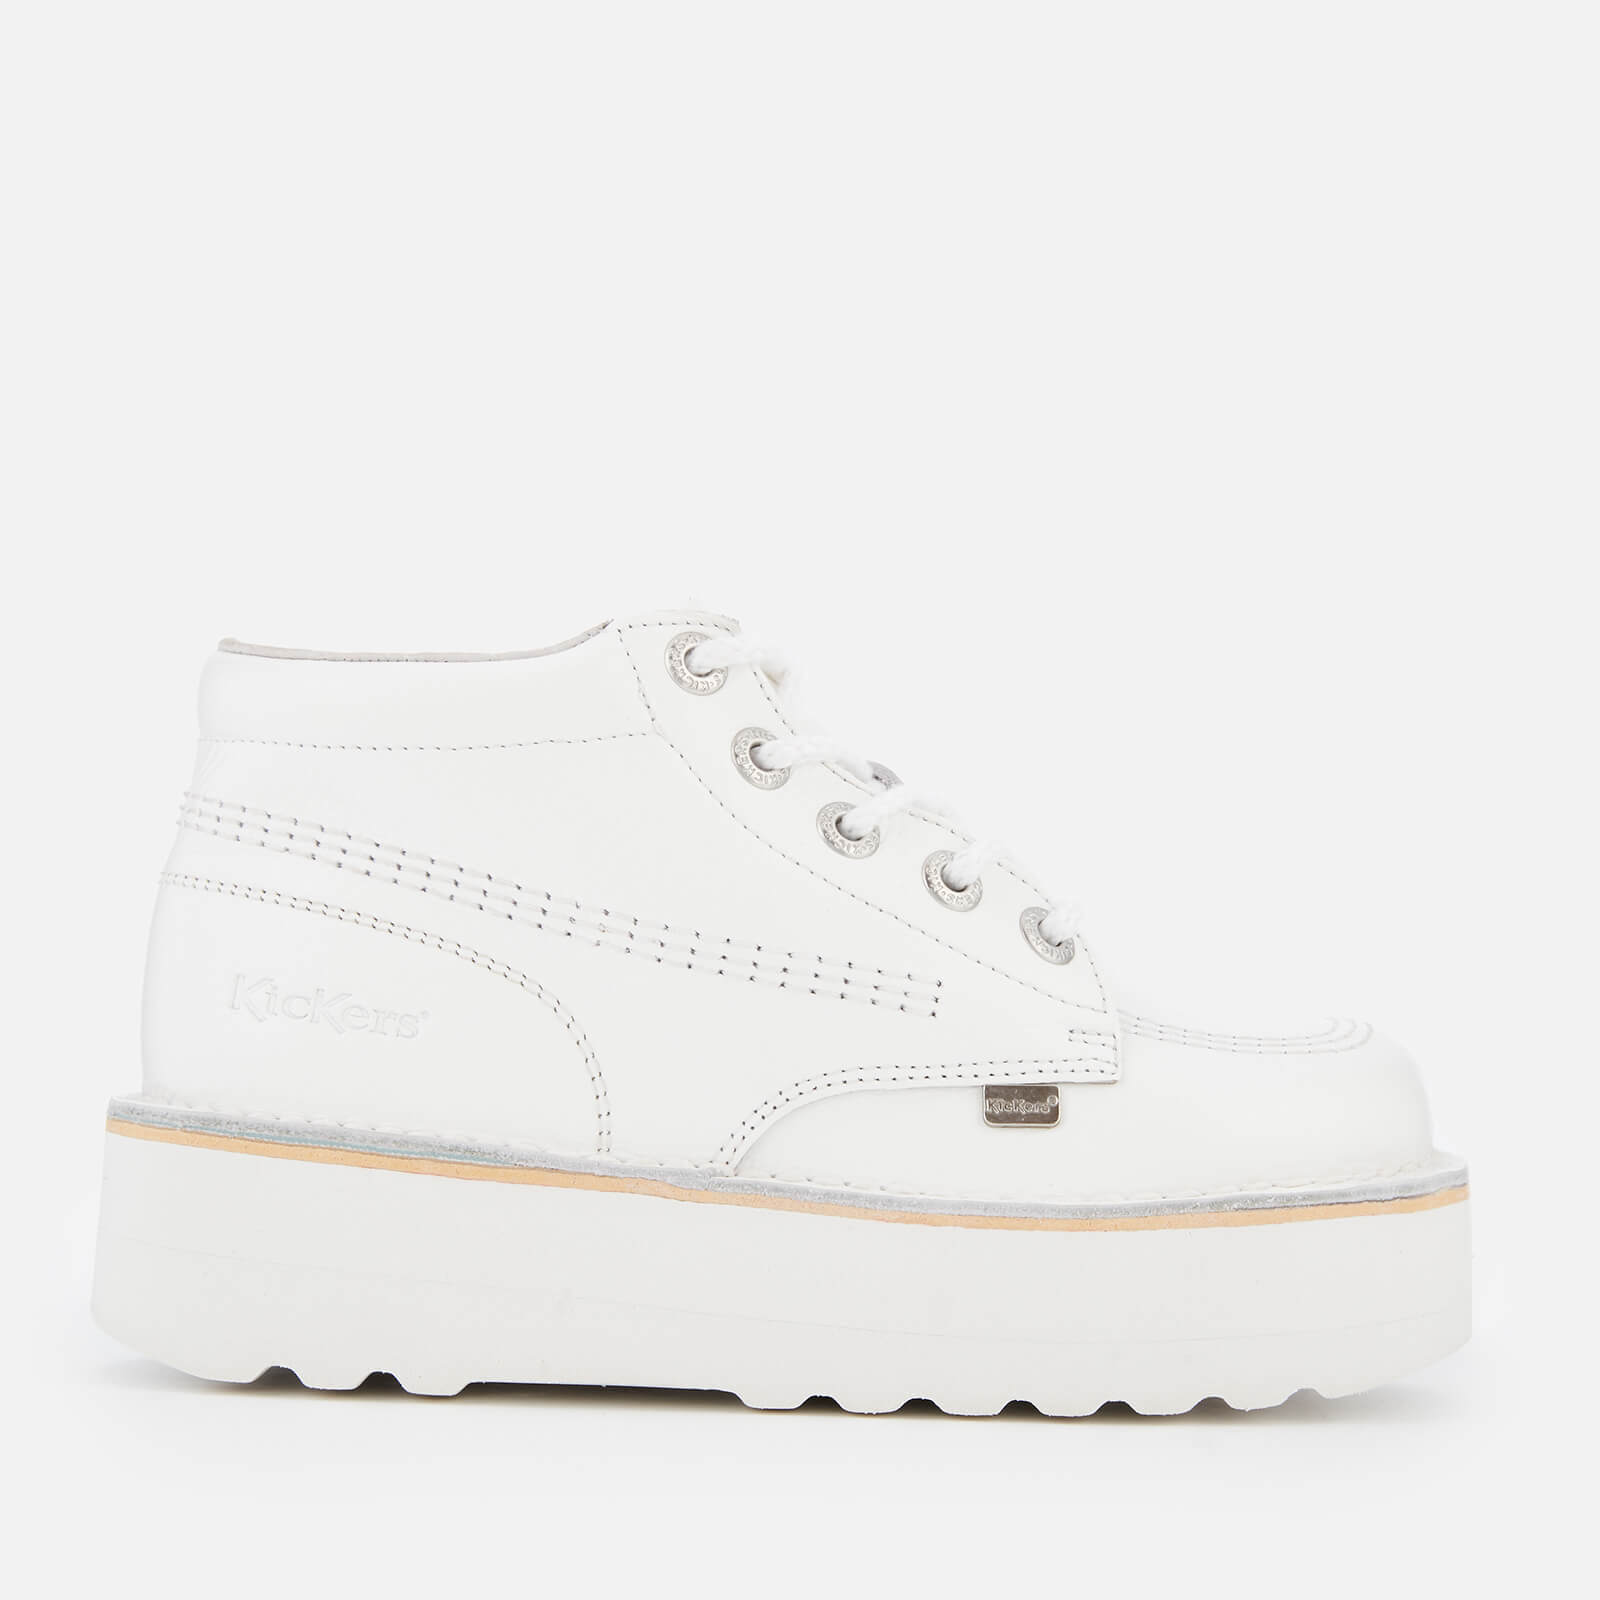 d694fa96c Kickers Women s Kick Hi-Stack Leather Boots - White Metallic Womens Footwear